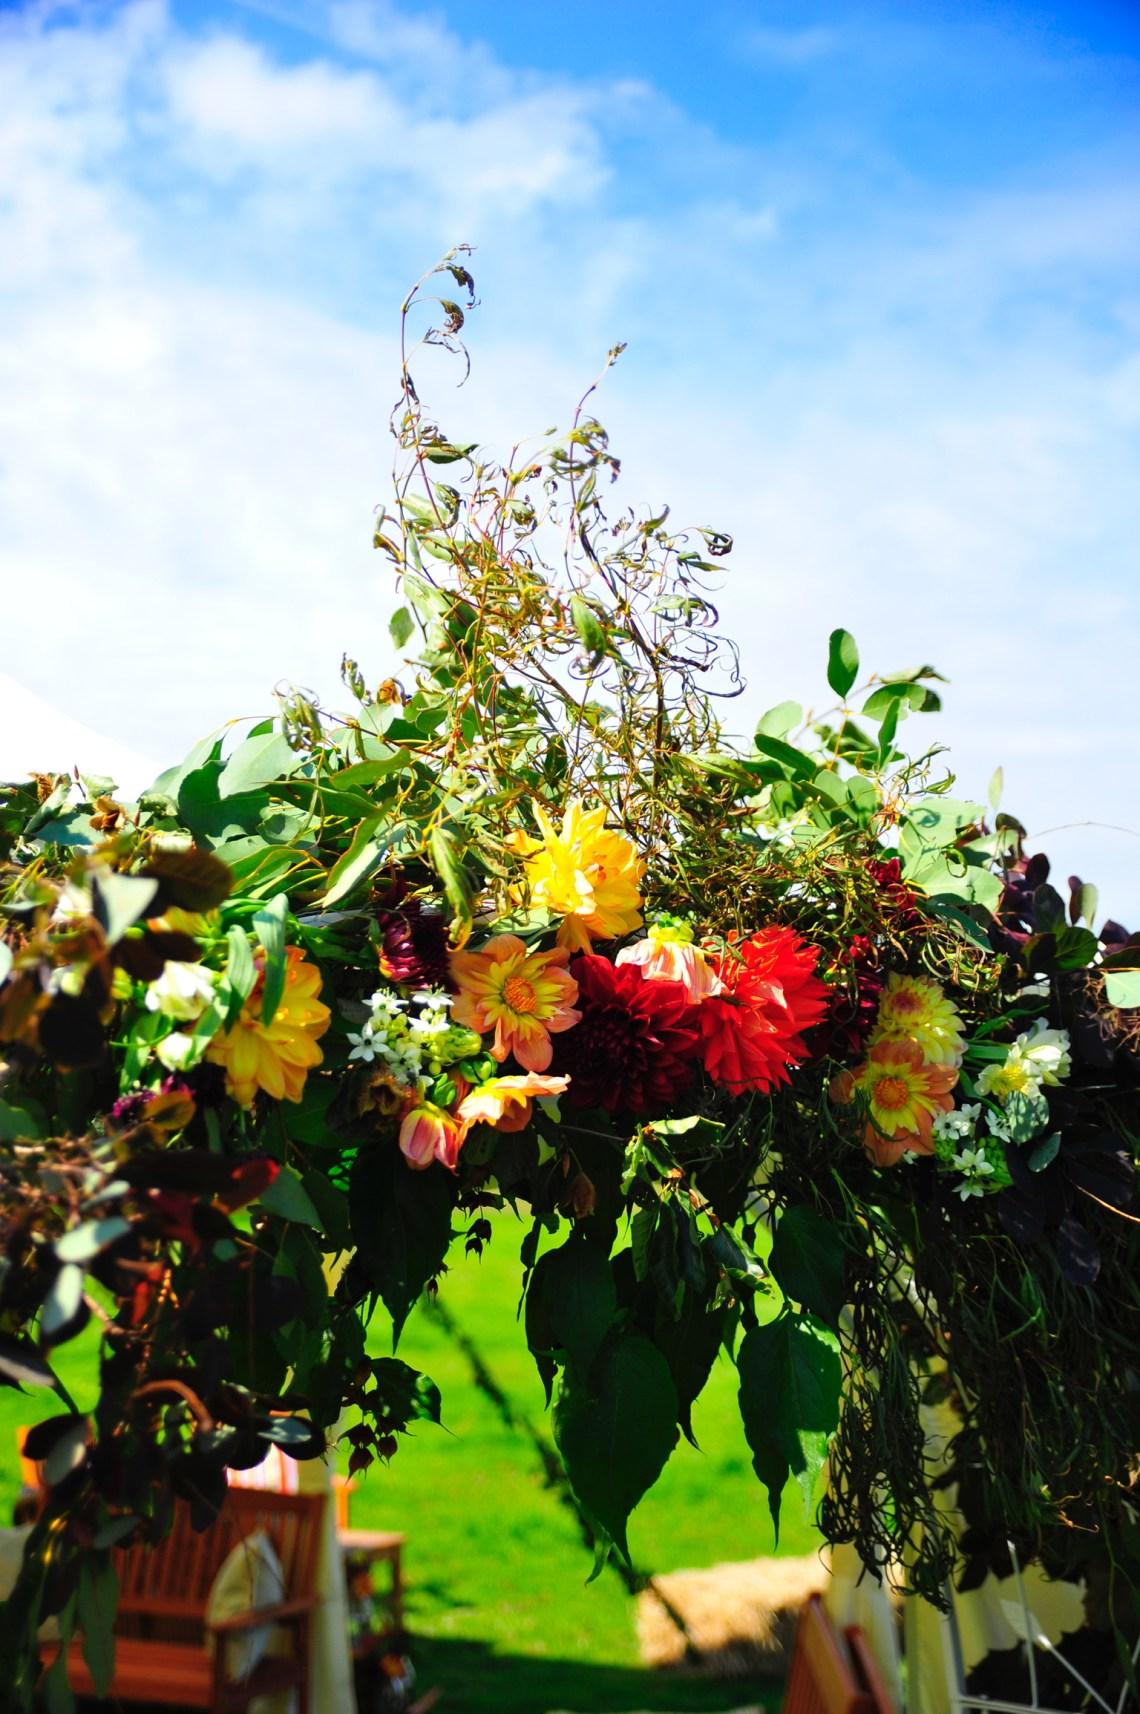 Christening Flowers – September, Cumbria